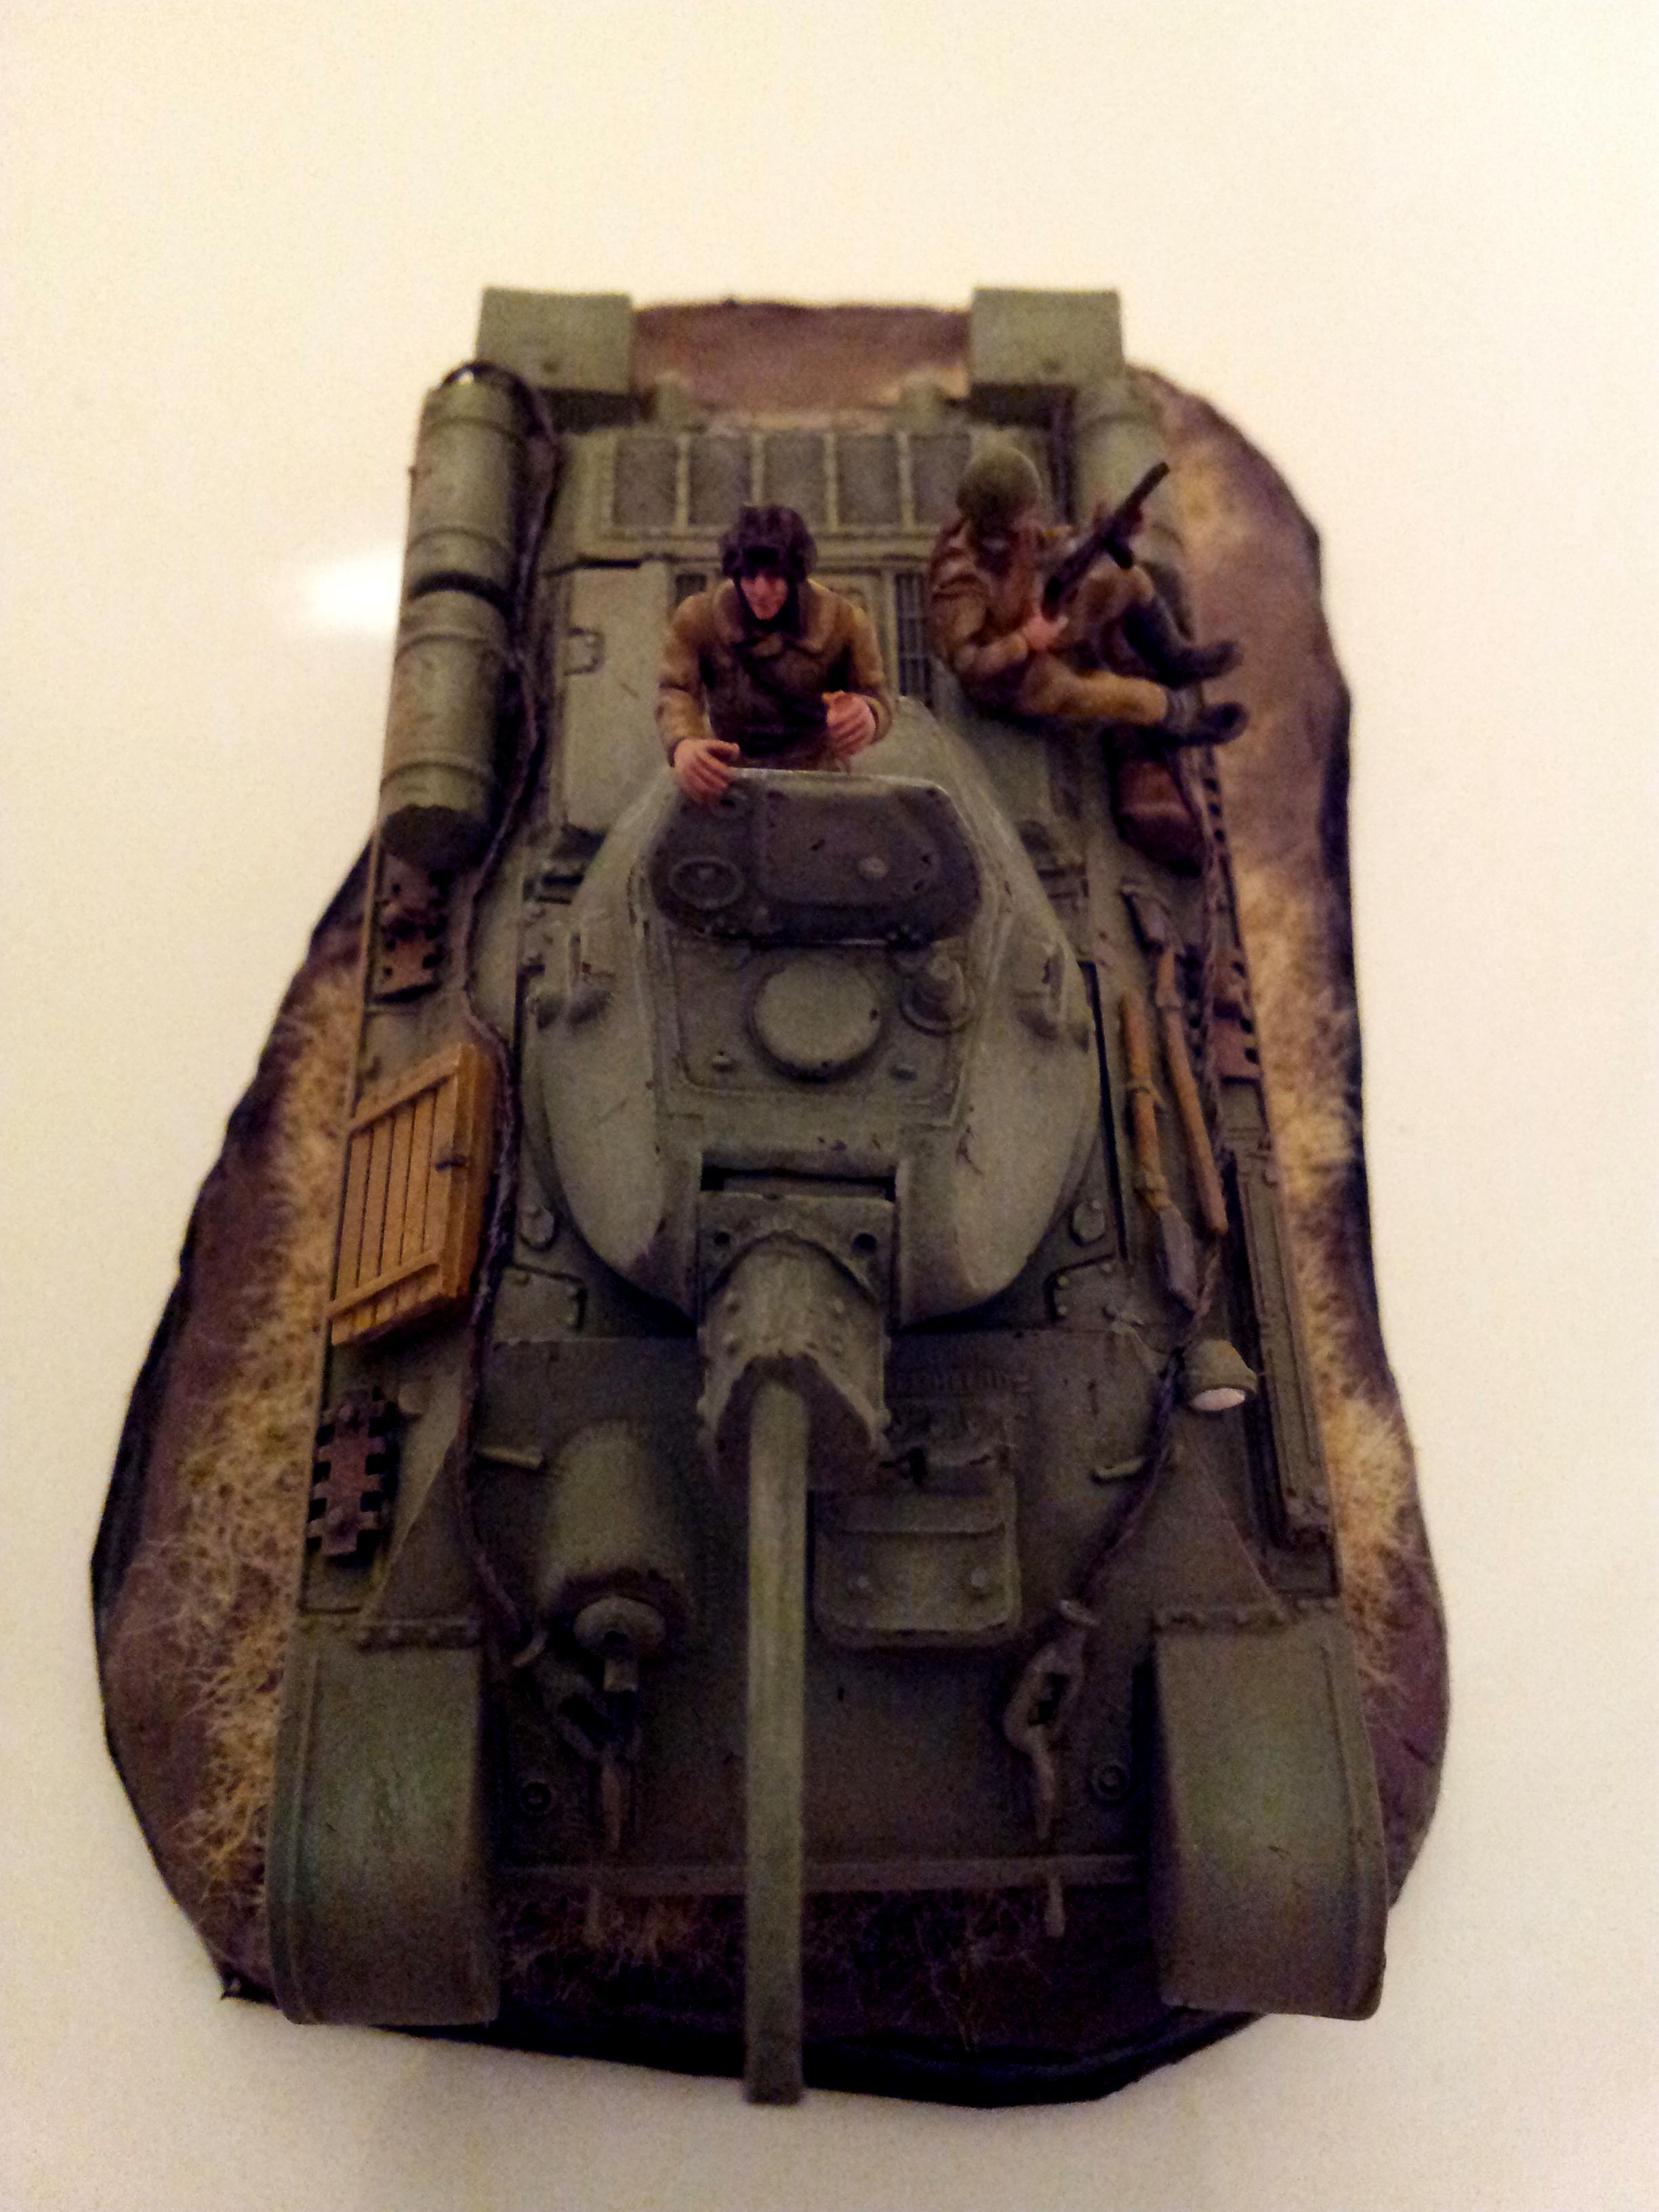 1/72, Braille, Russians, T-34, Tank, World War 2